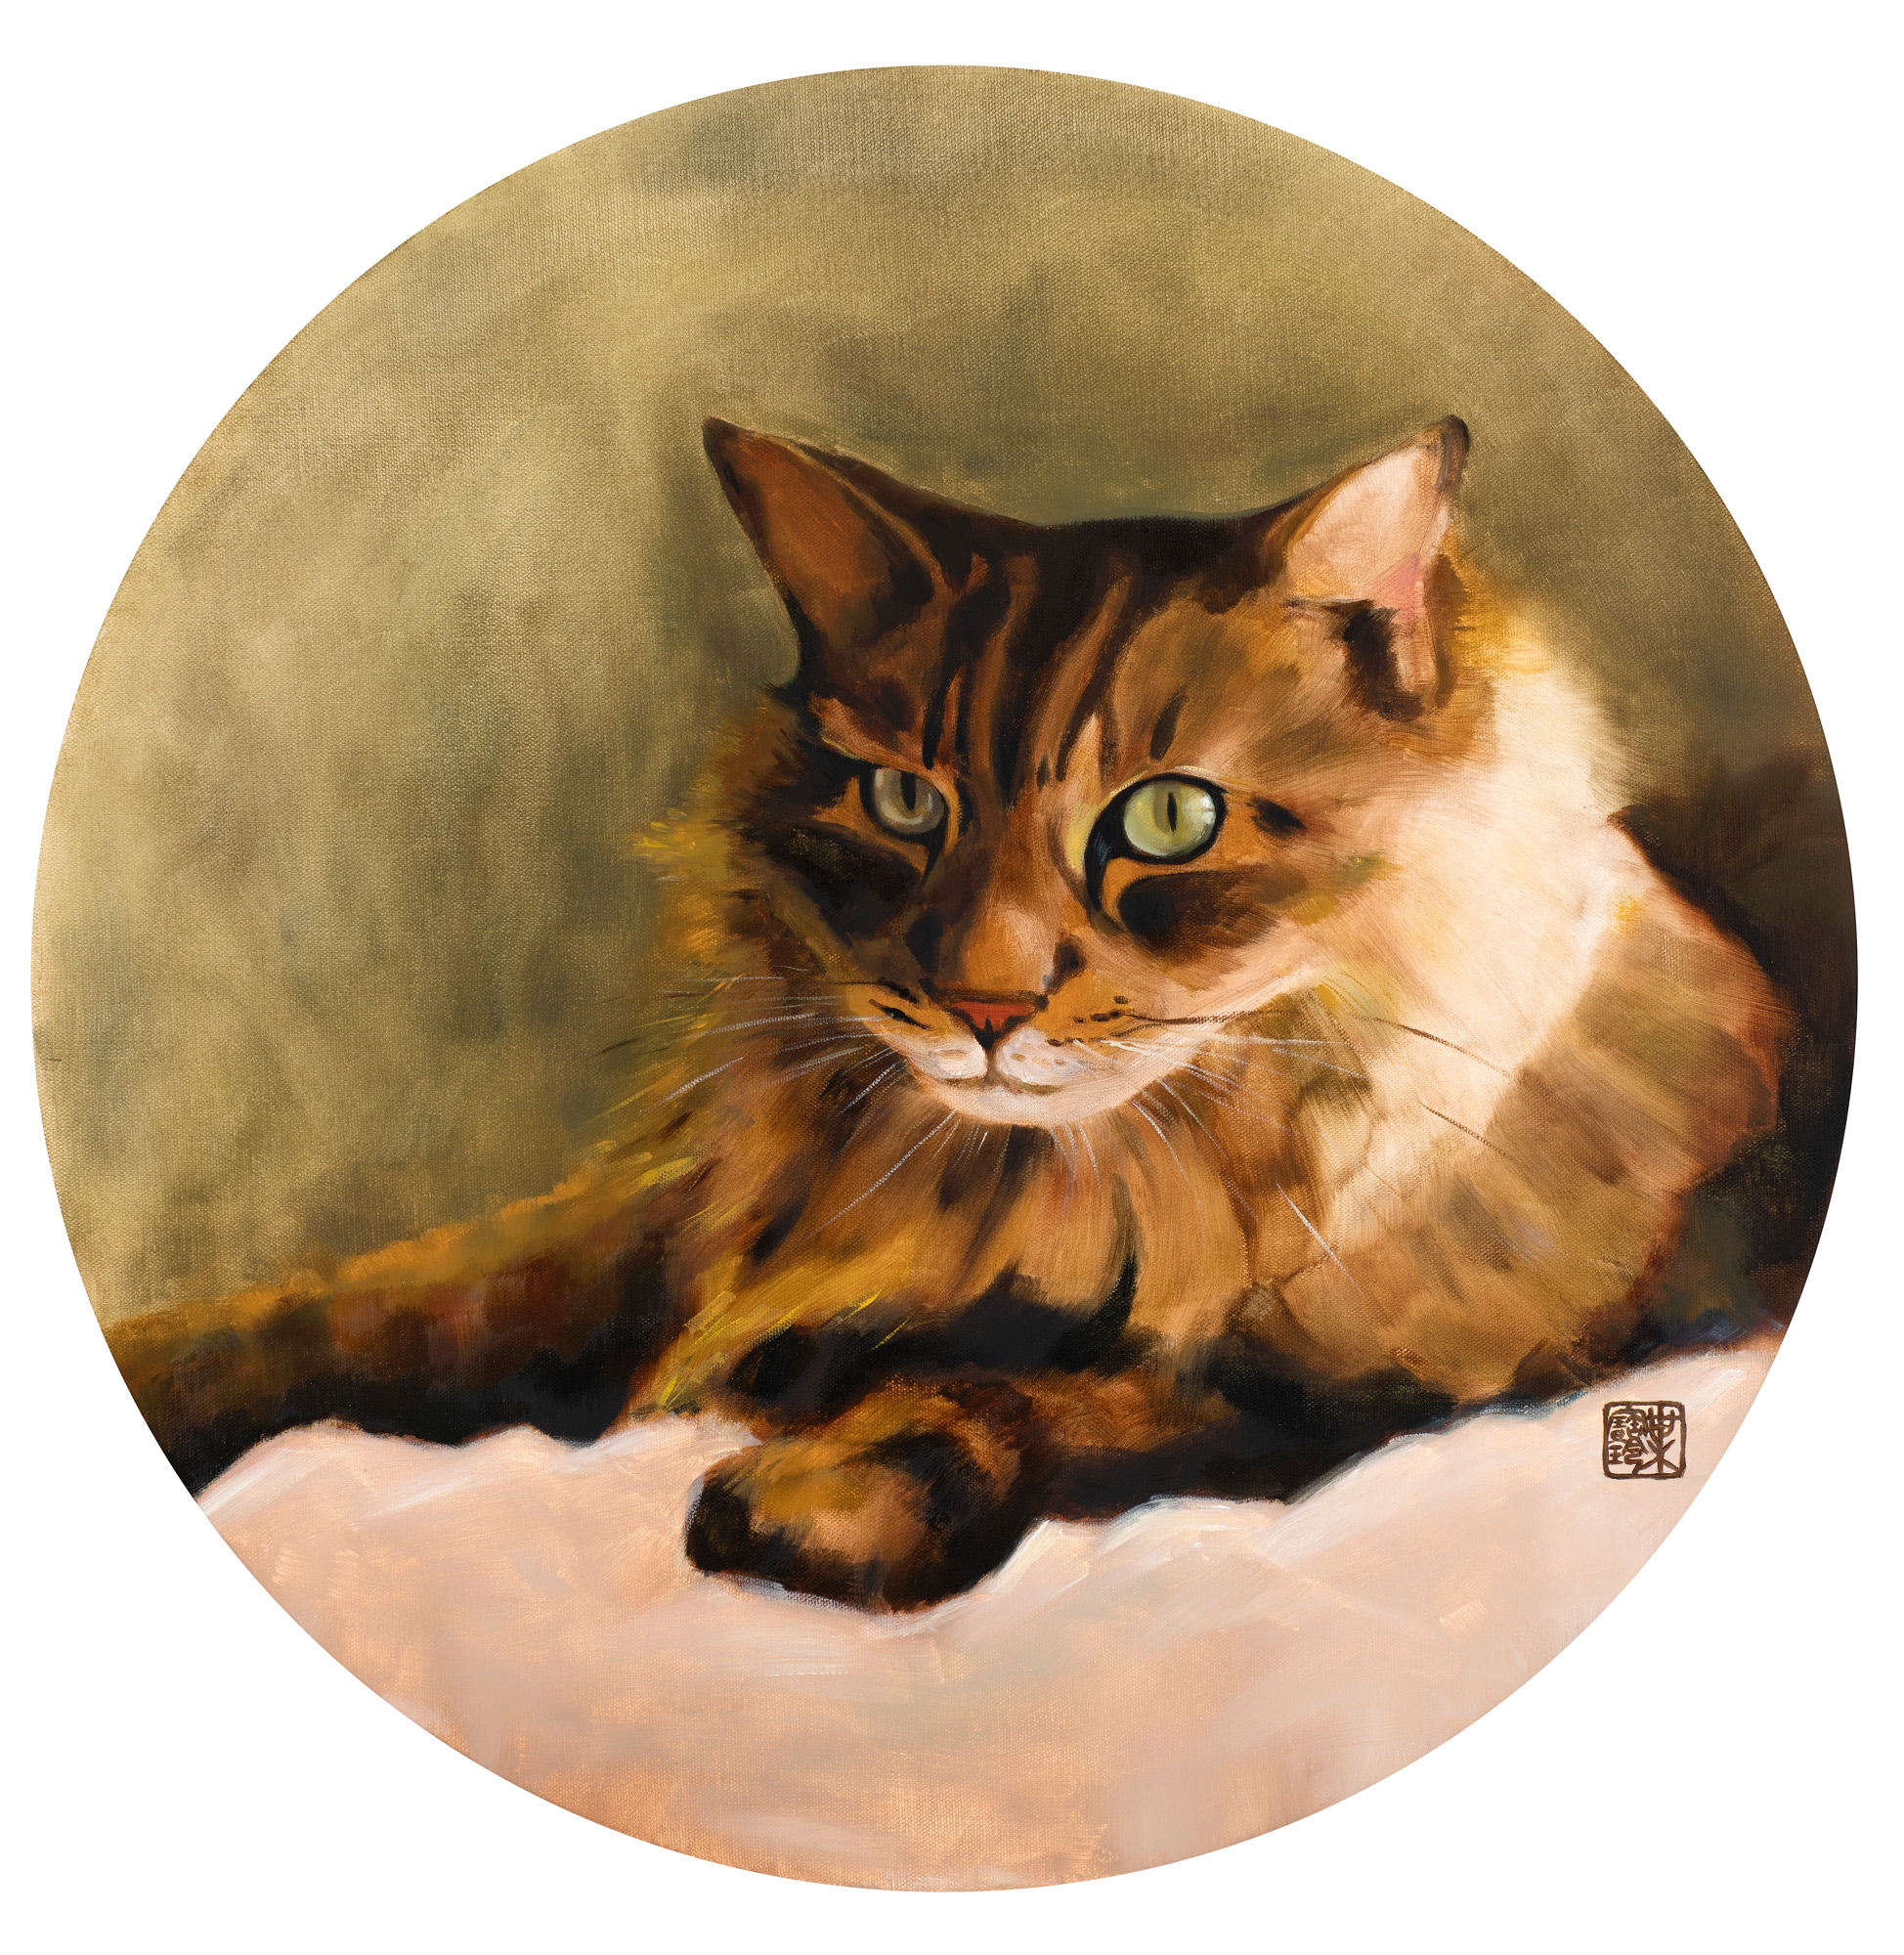 Pau Ling Yap | Thor | Oil on circular canvas | 61cm diameter | £1350 (print £280)